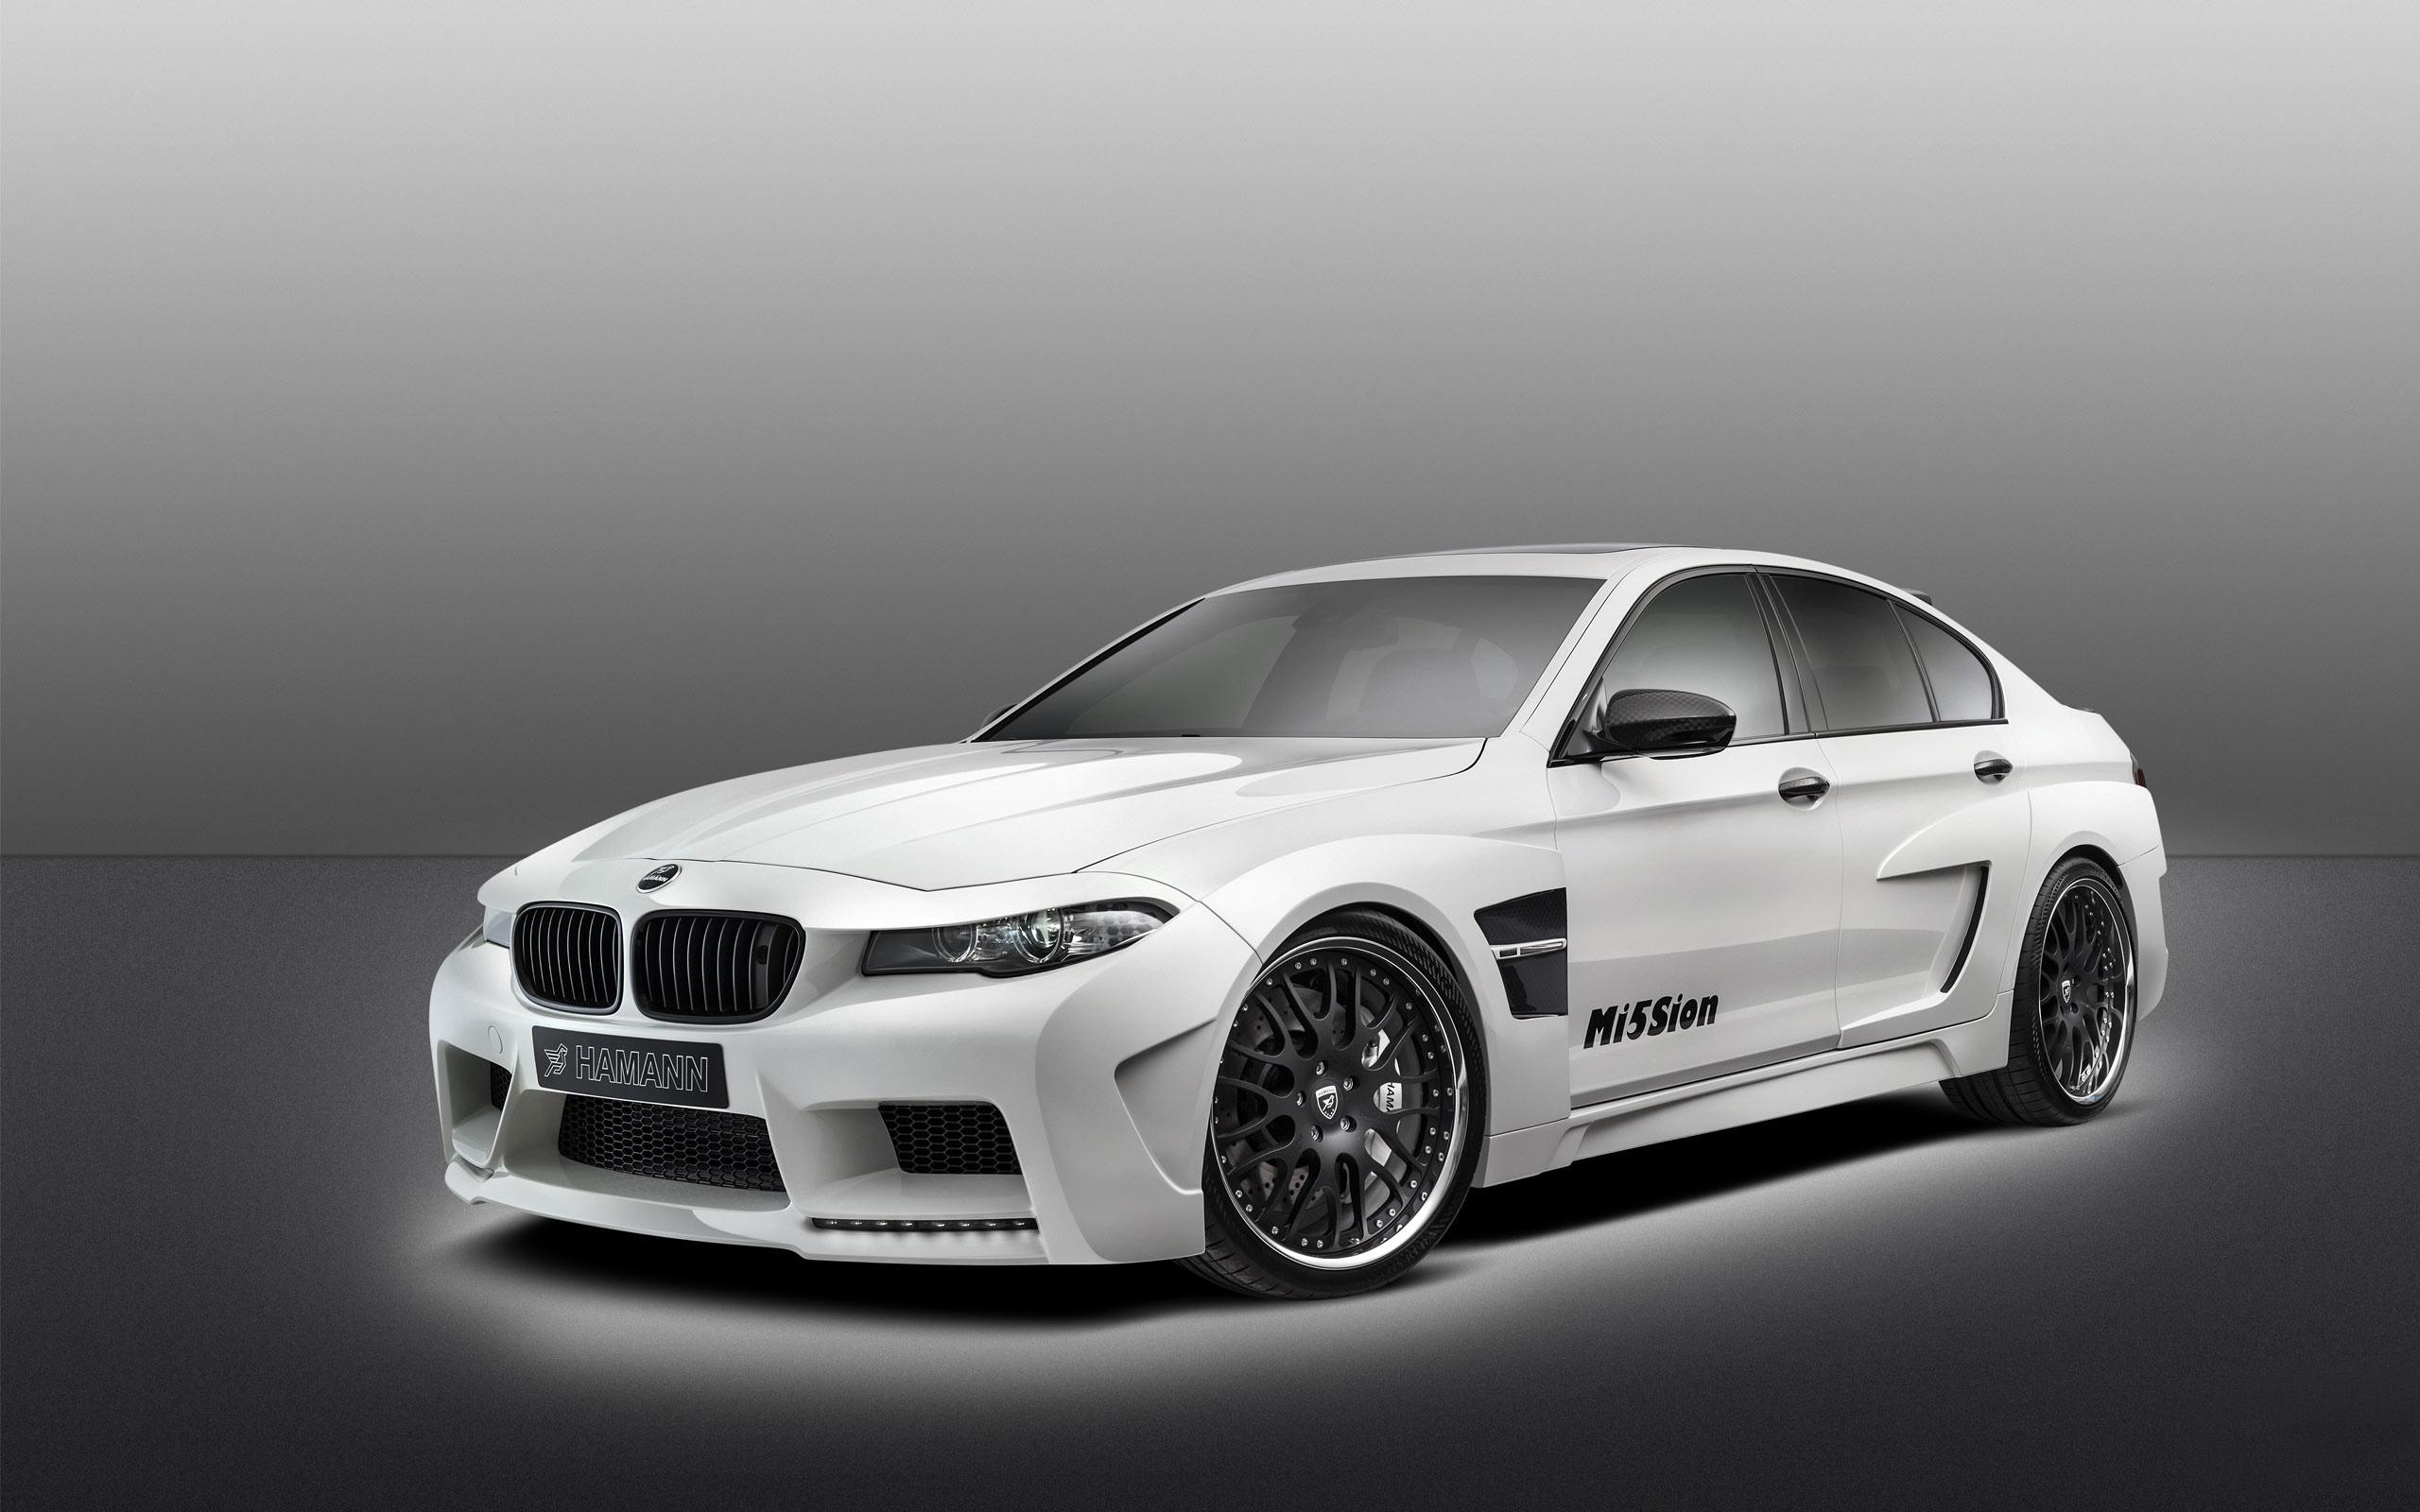 BMW M5 Wallpaper Widescreen - WallpaperSafari